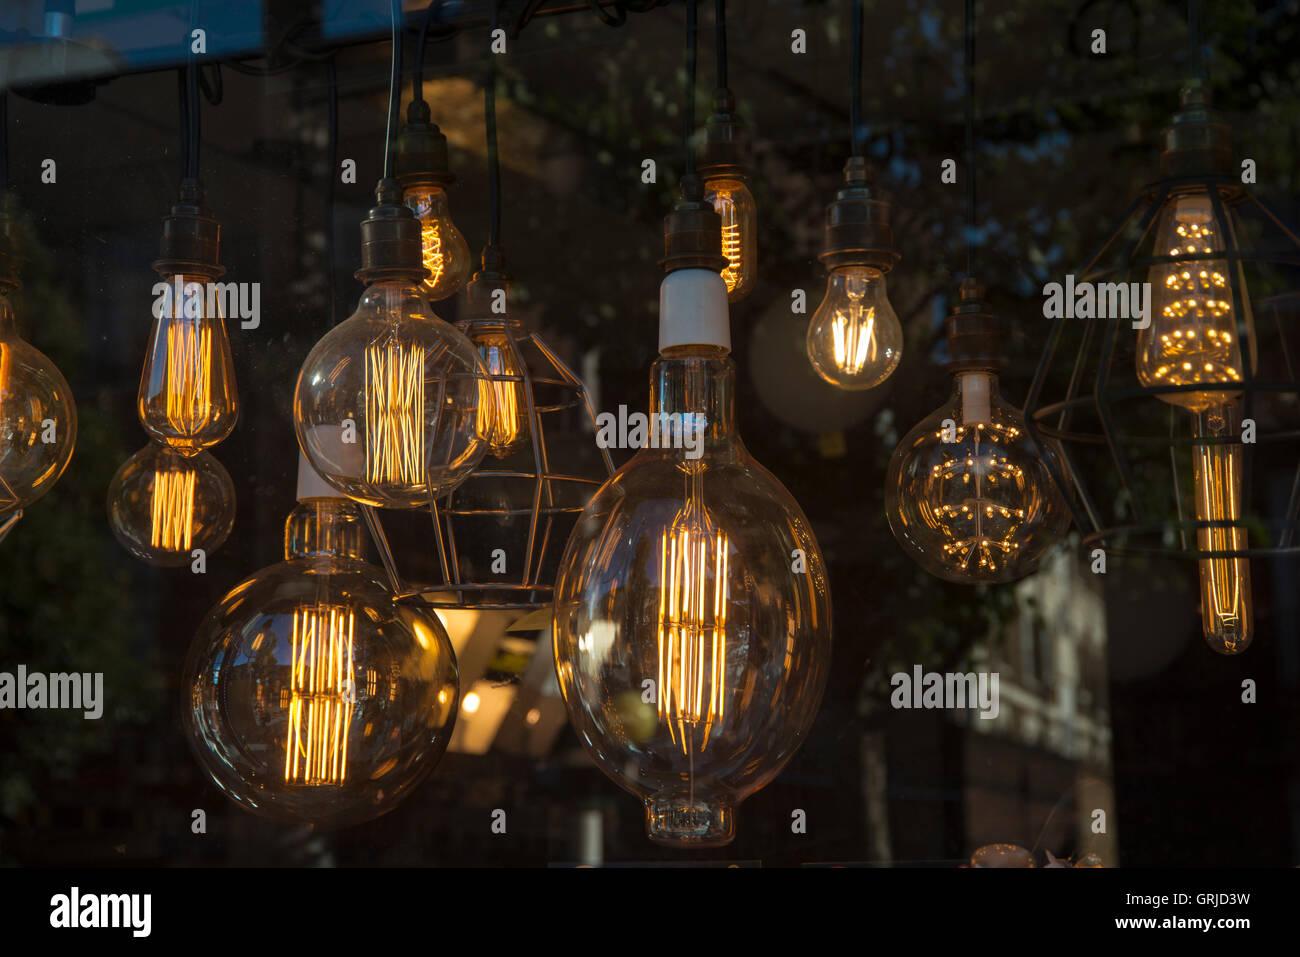 lightbulbs hanging in a lighting shop window - Stock Image